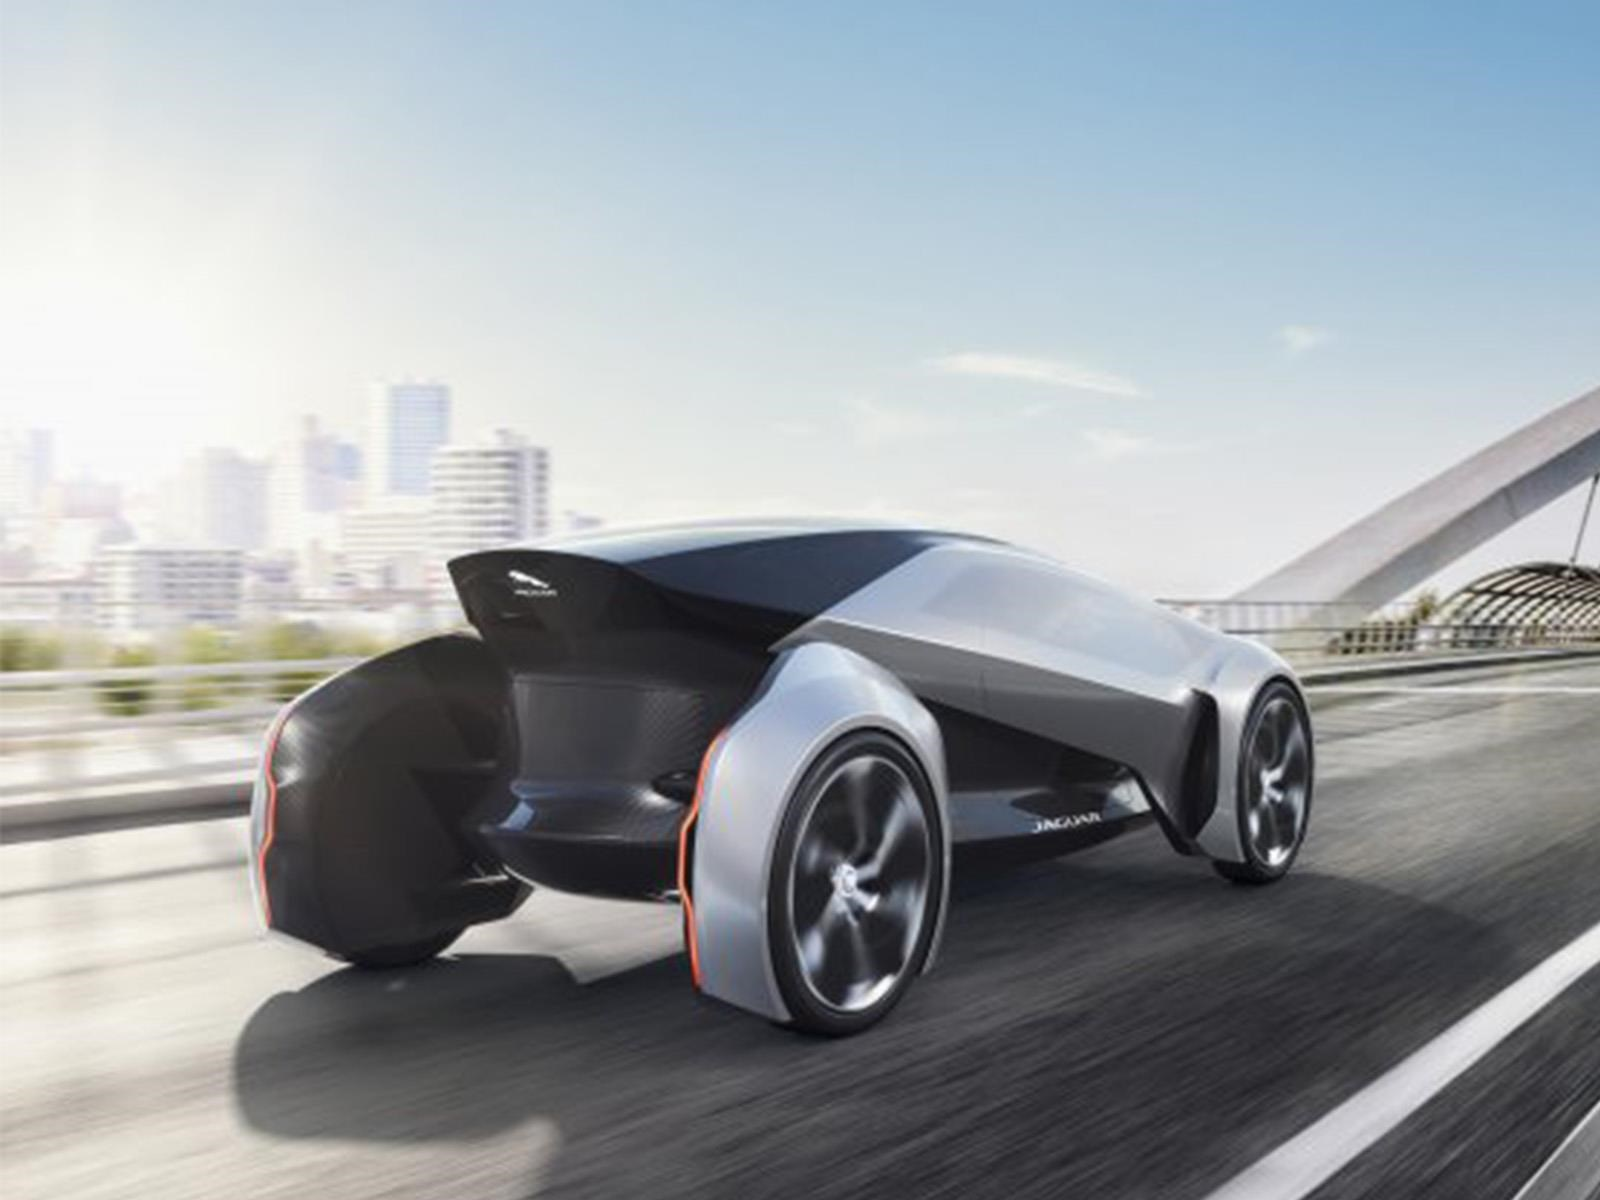 Jaguar Future-Type Concept, prototipo británico Sci-Fi